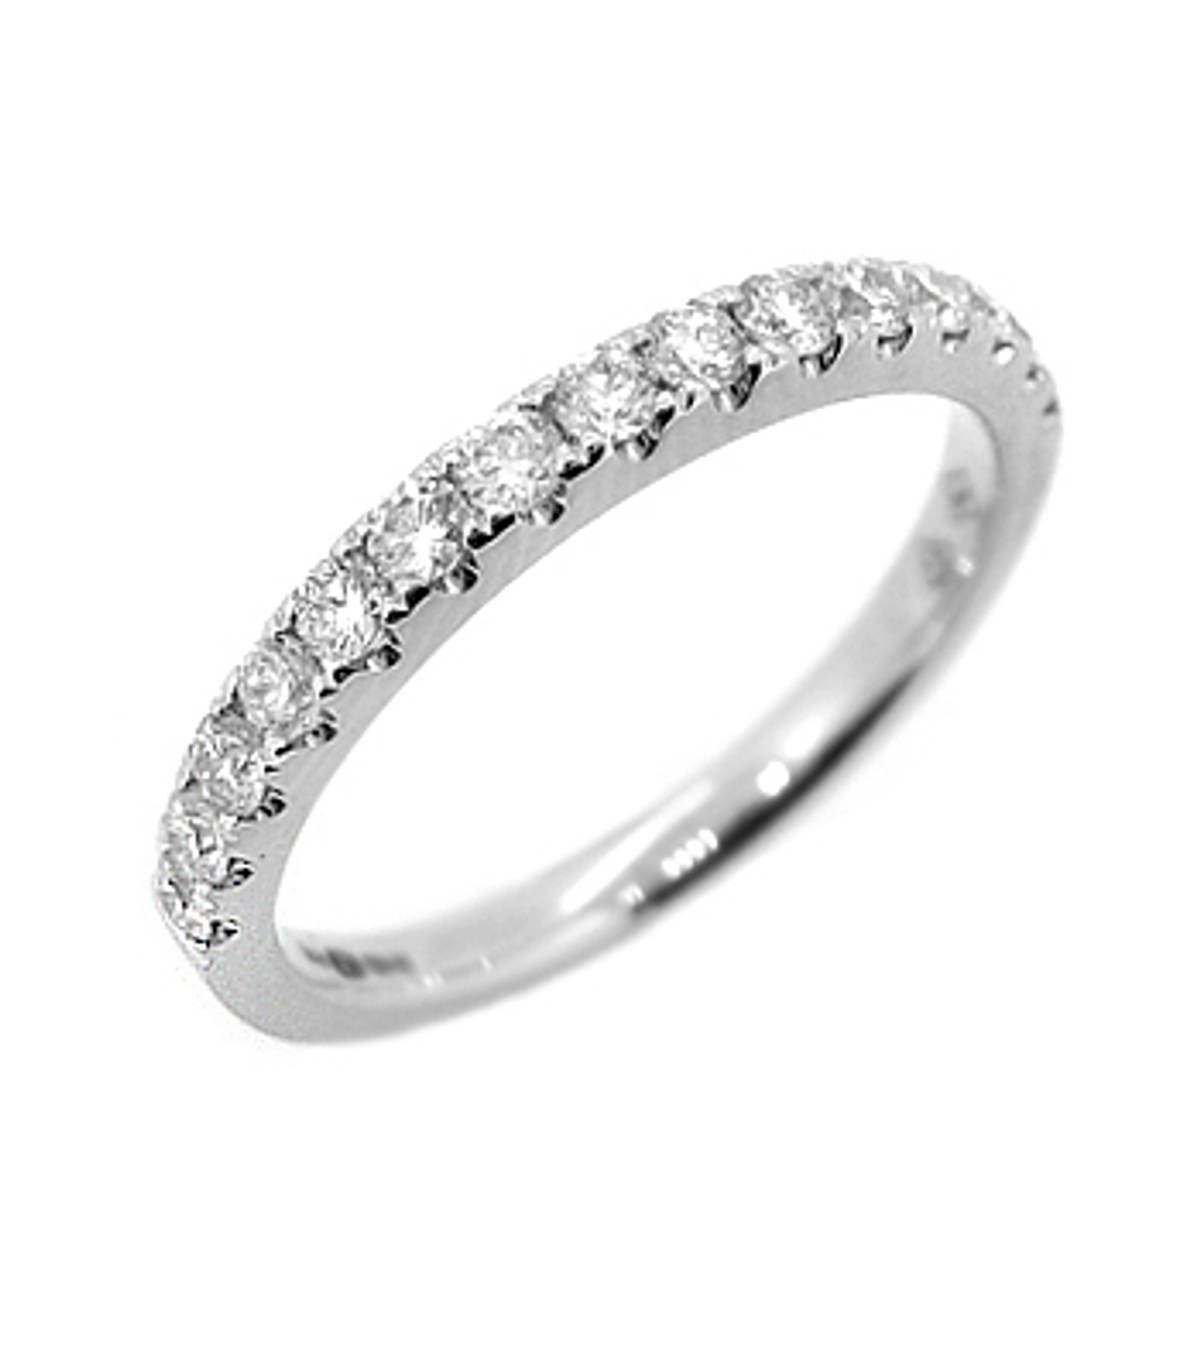 18k white gold brilliant cut diamond claw set wedding ring Carat: total diamond weight 0.40cts Metal: 18k white gold